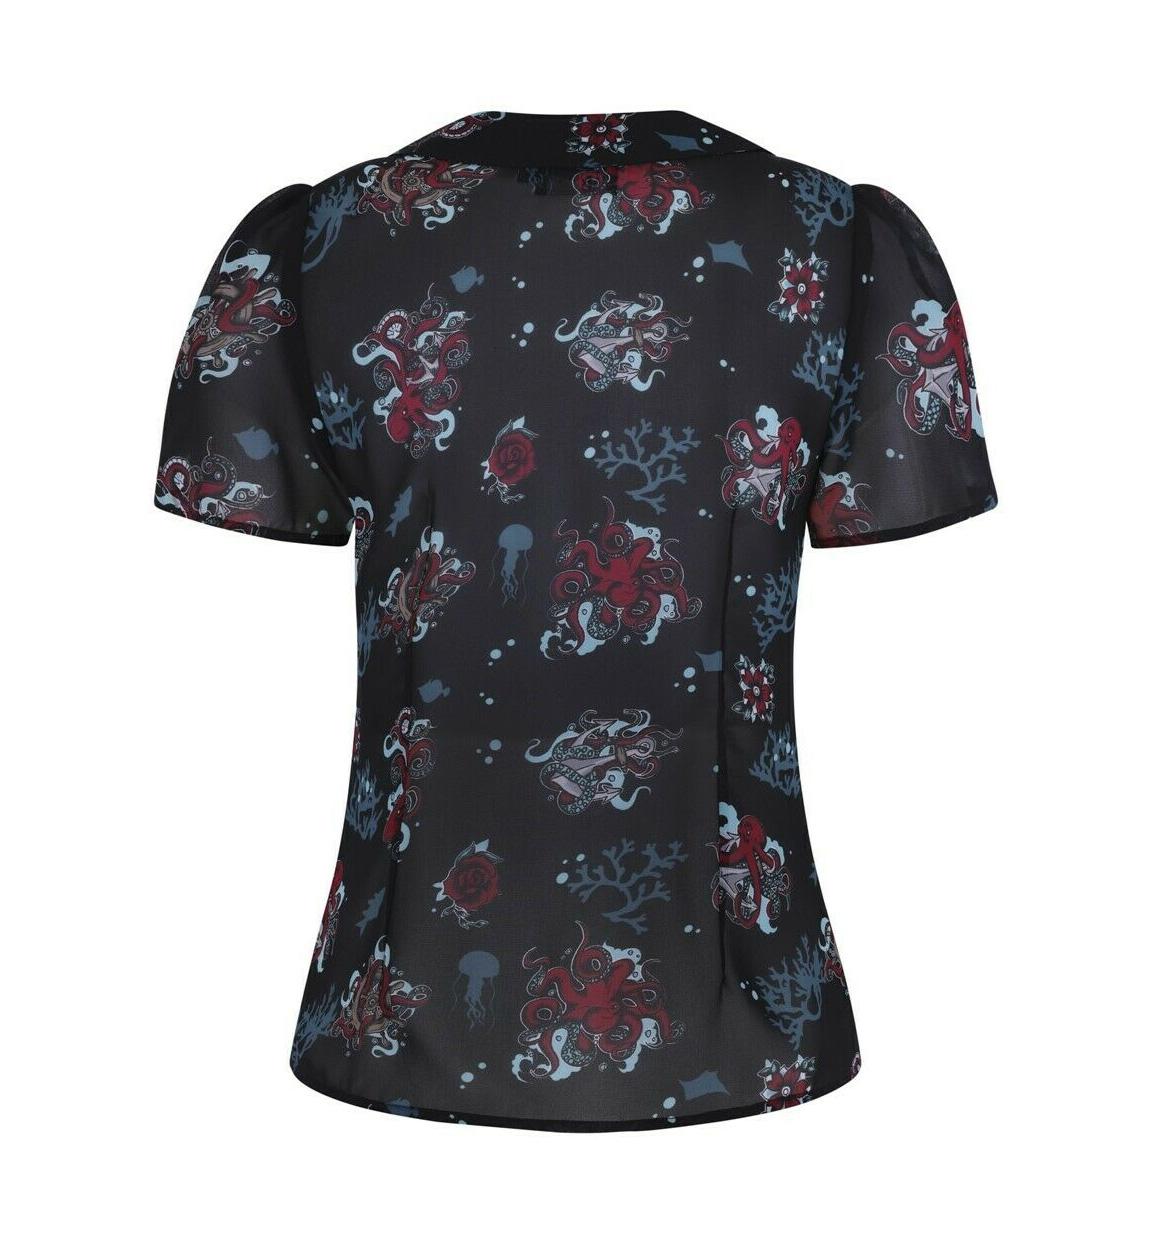 Hell-Bunny-50s-Shirt-Top-Black-Ocean-Octopus-Roses-POSEIDON-Blouse-All-Sizes thumbnail 19